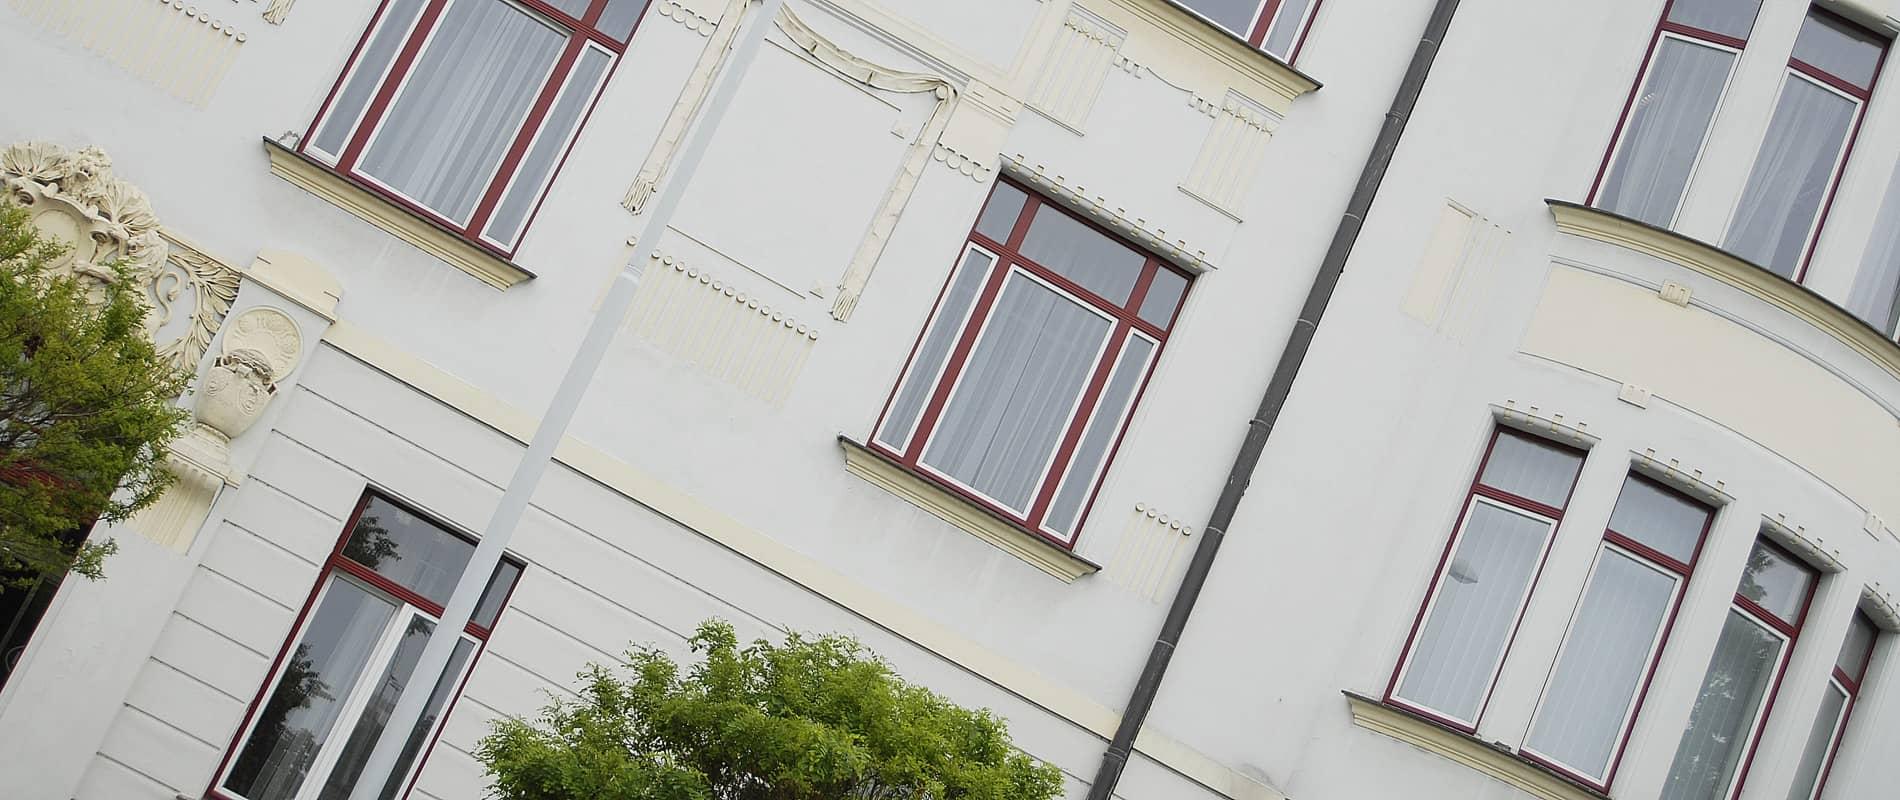 Rekonstrukce budov firmy ASTRID